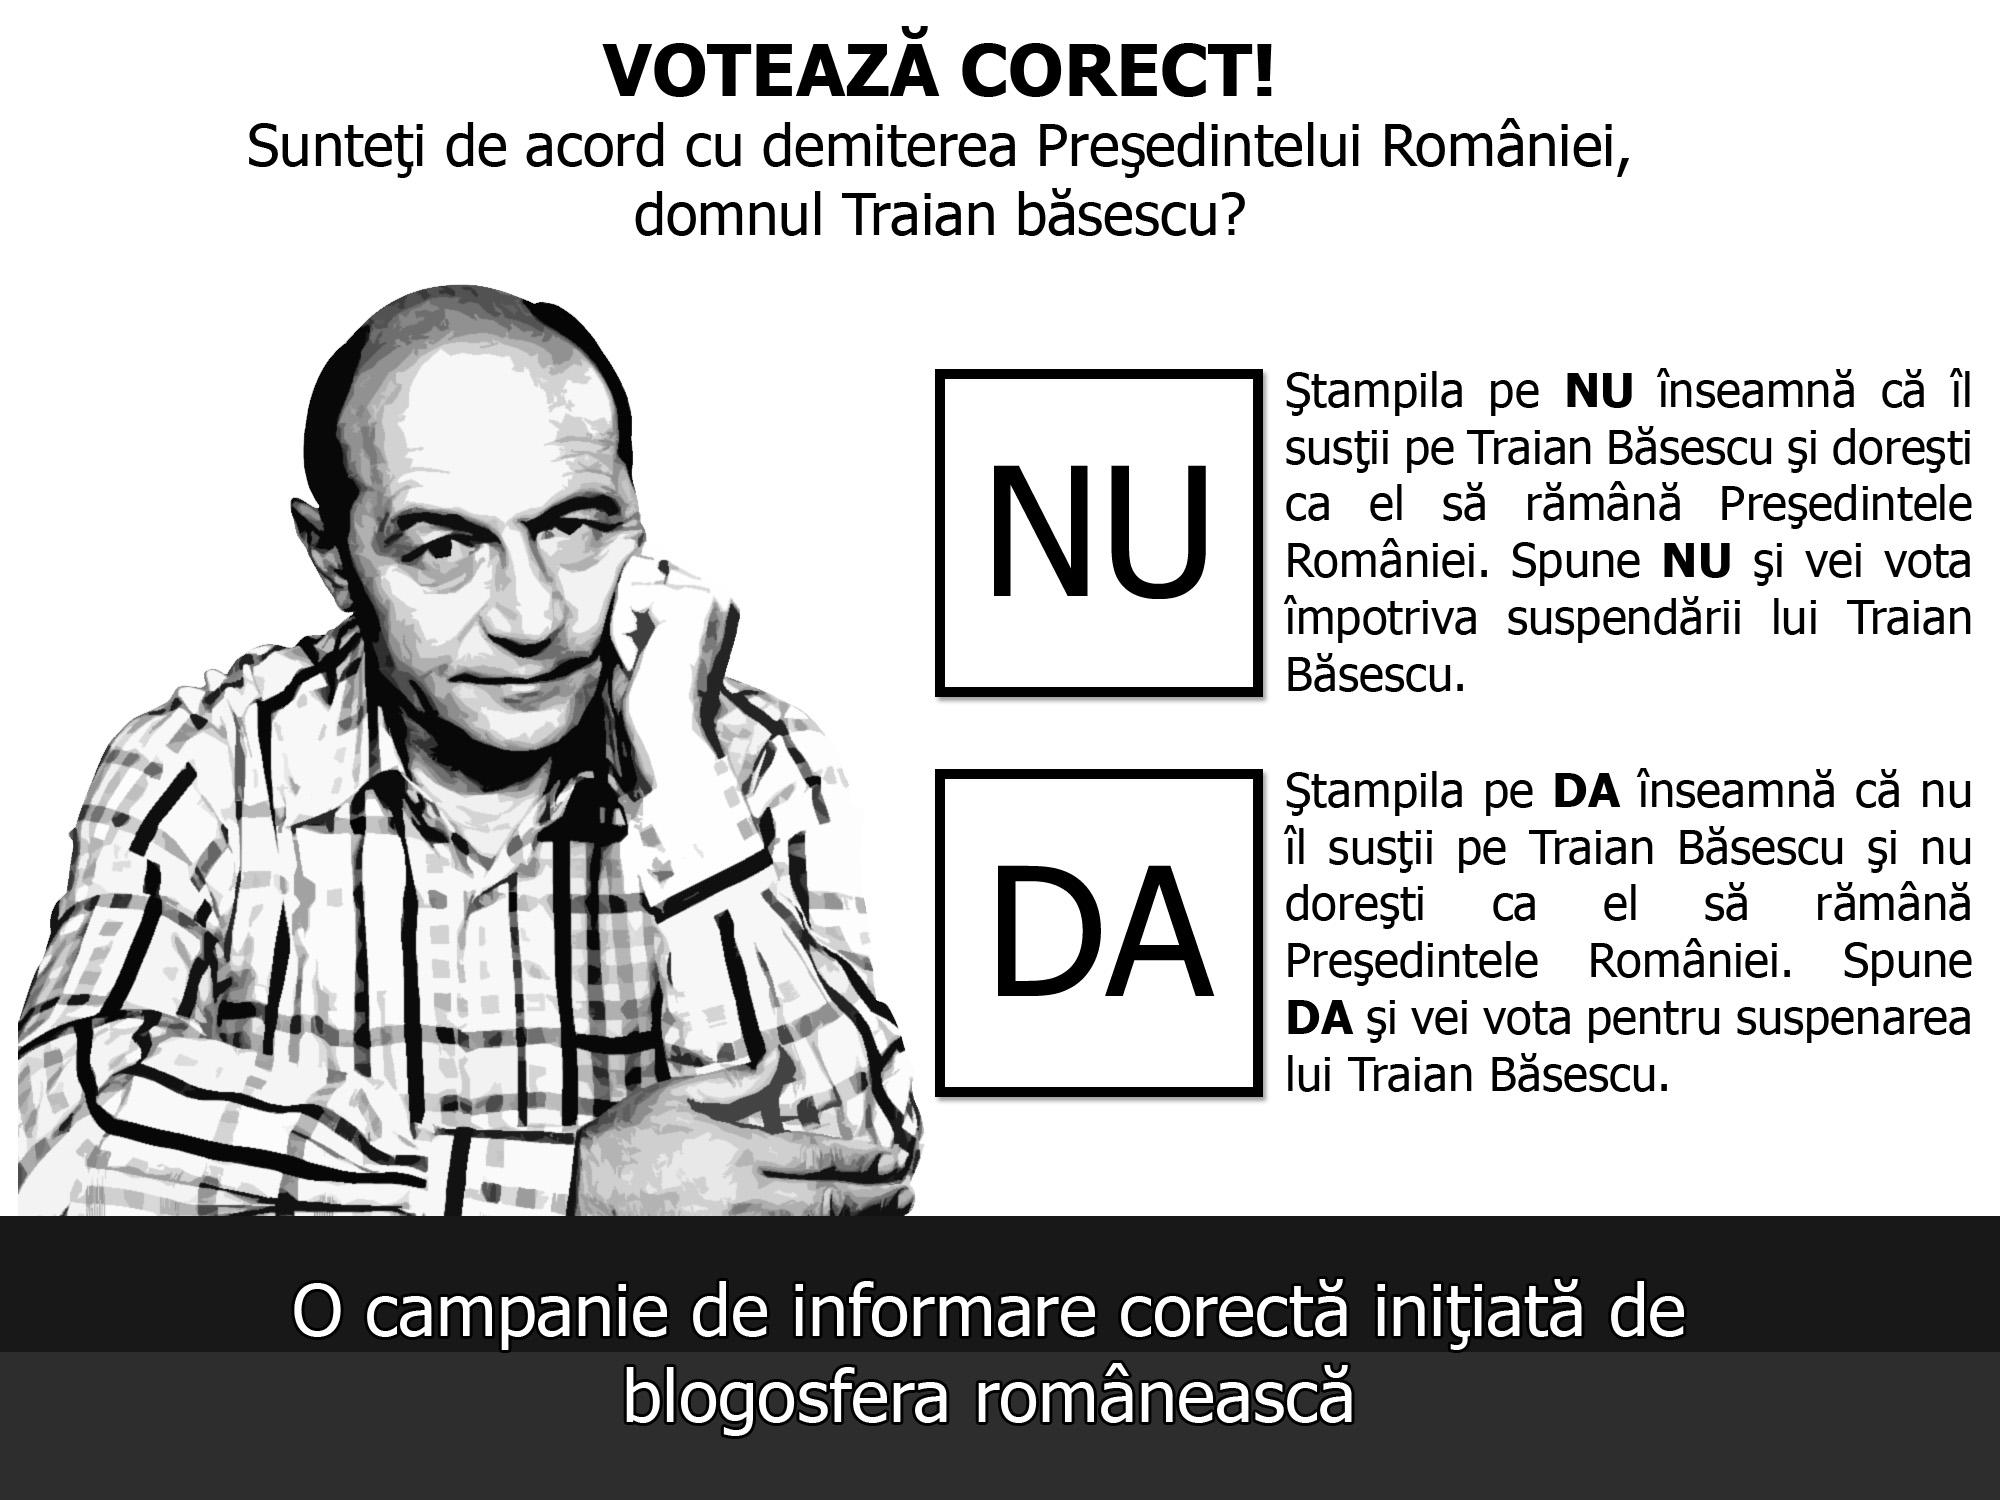 voteaza-corect.jpg